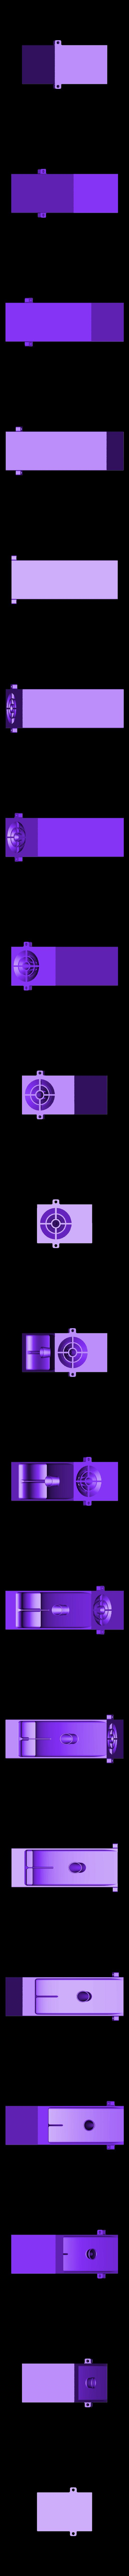 Horn.stl Download free STL file Mini Loudspeaker Horn • Object to 3D print, zx82